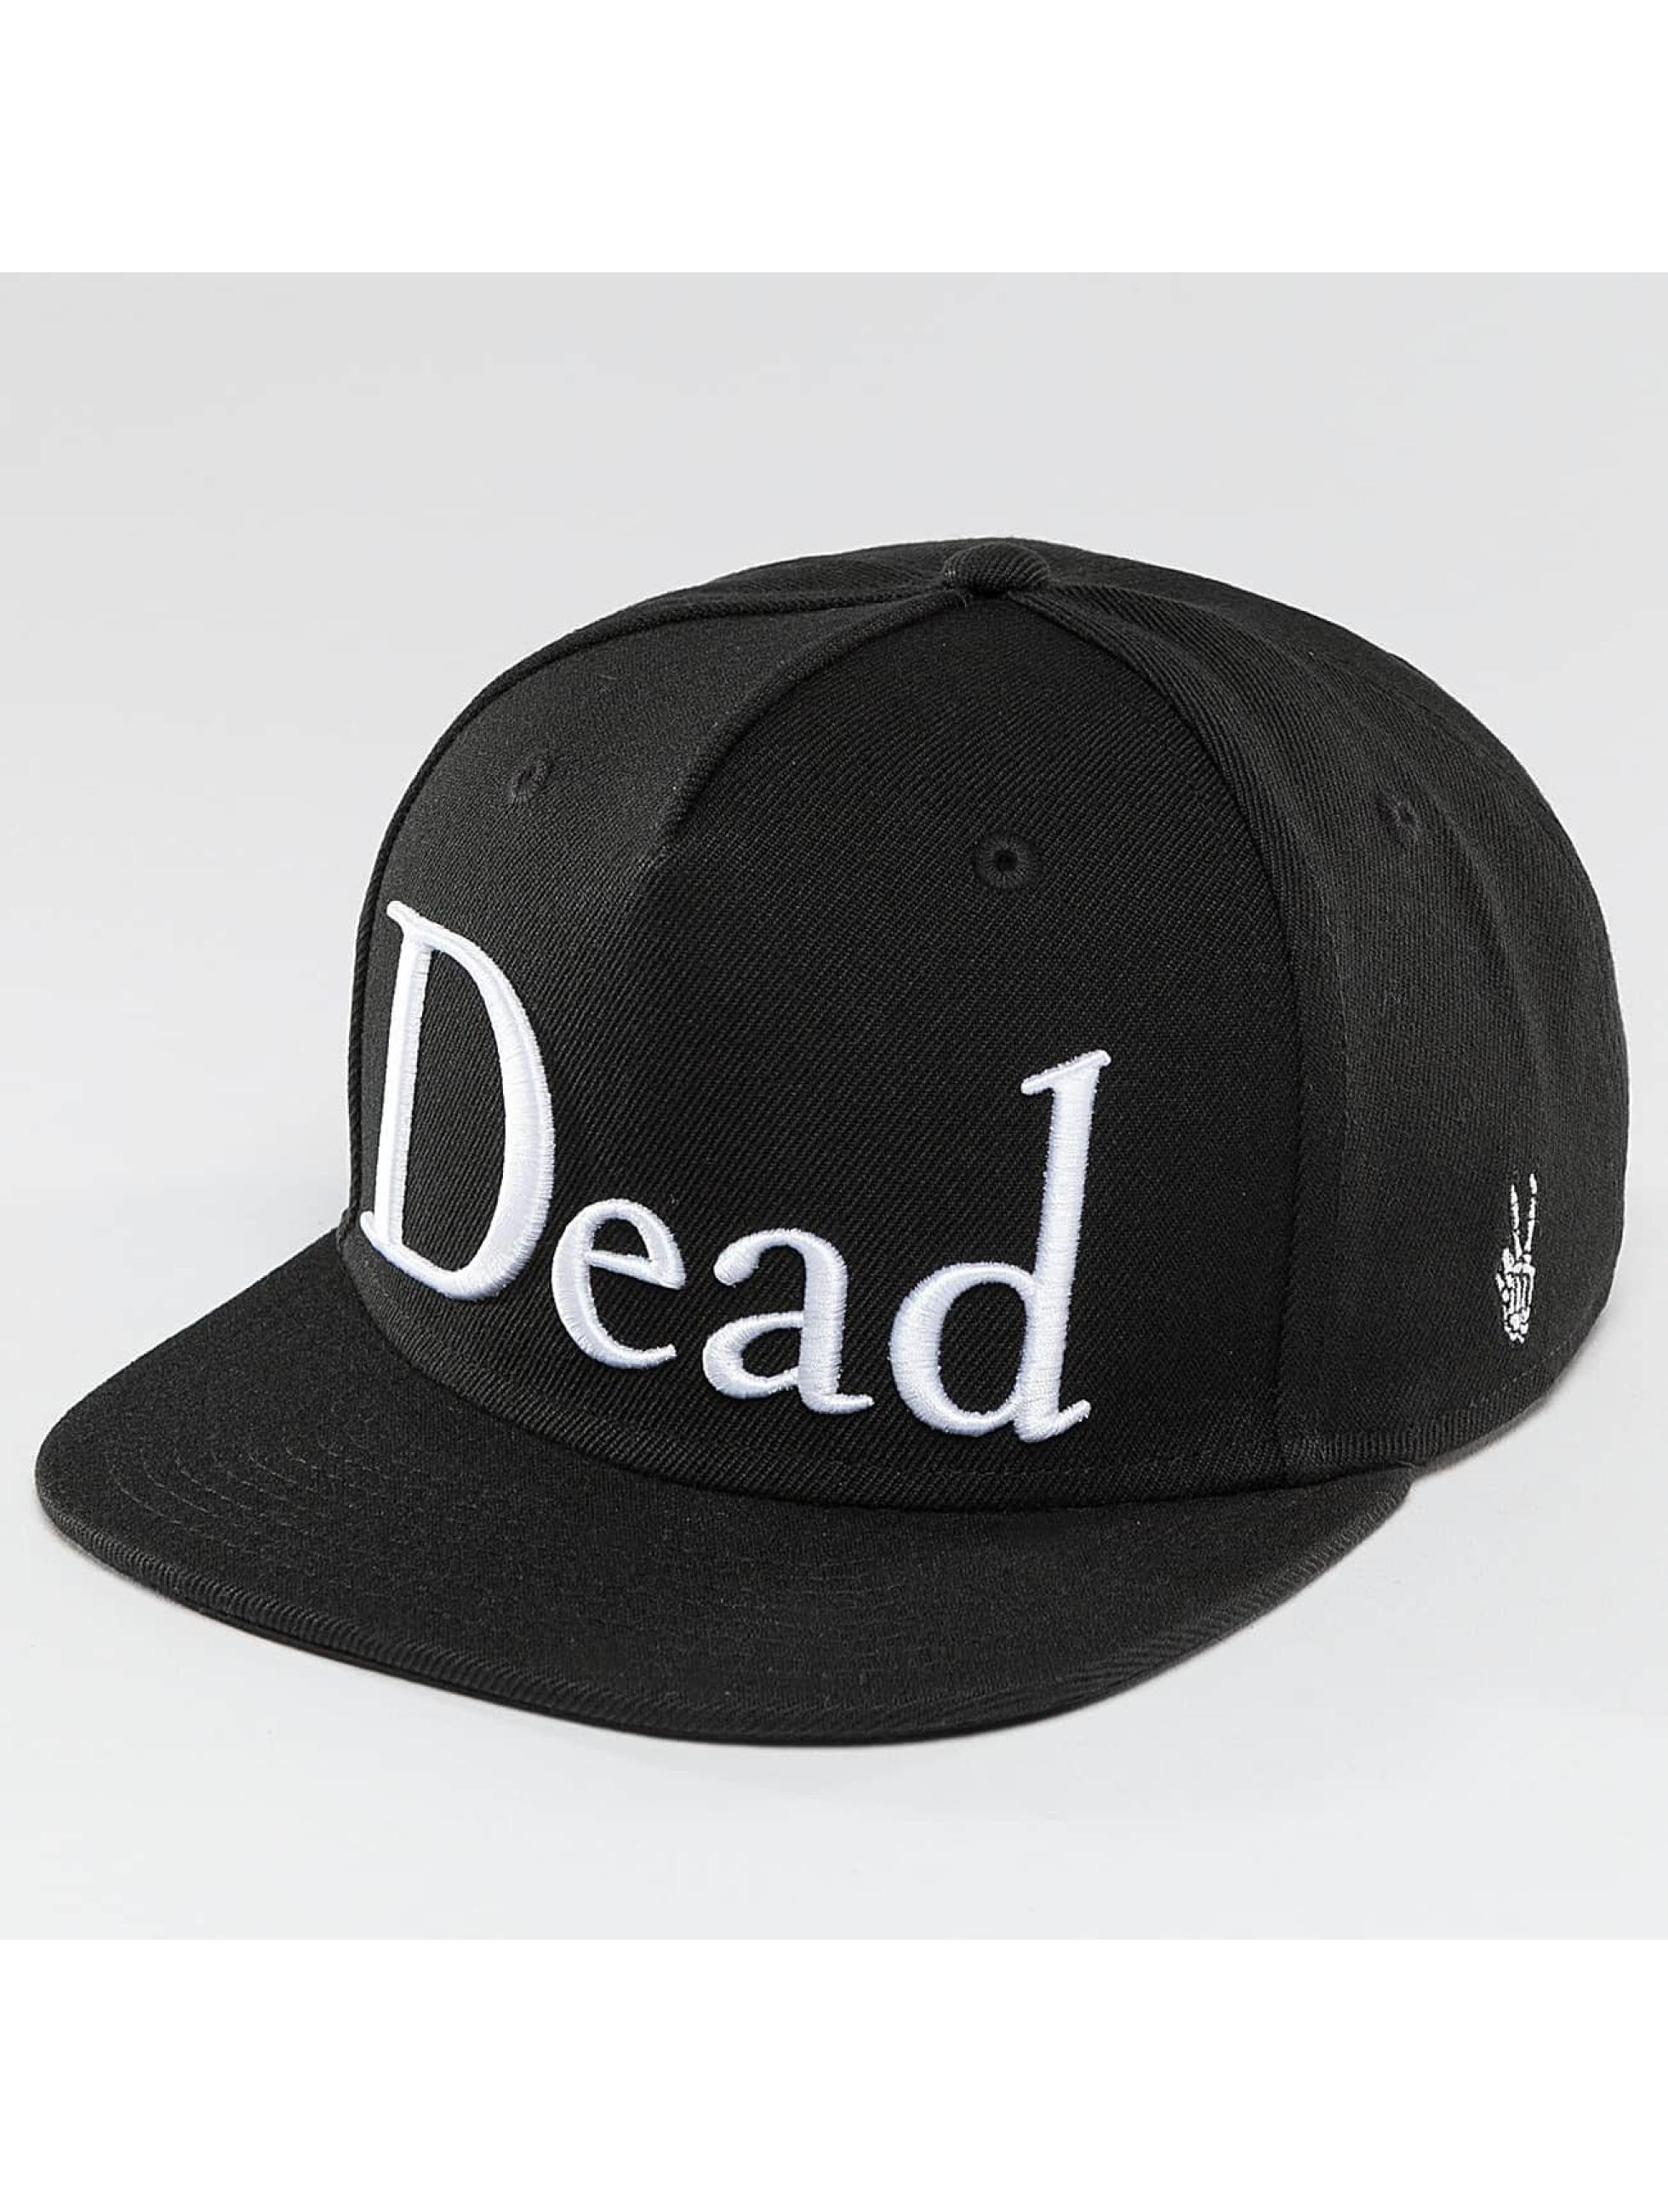 NEFF Männer,Frauen Snapback Cap Dead in schwarz